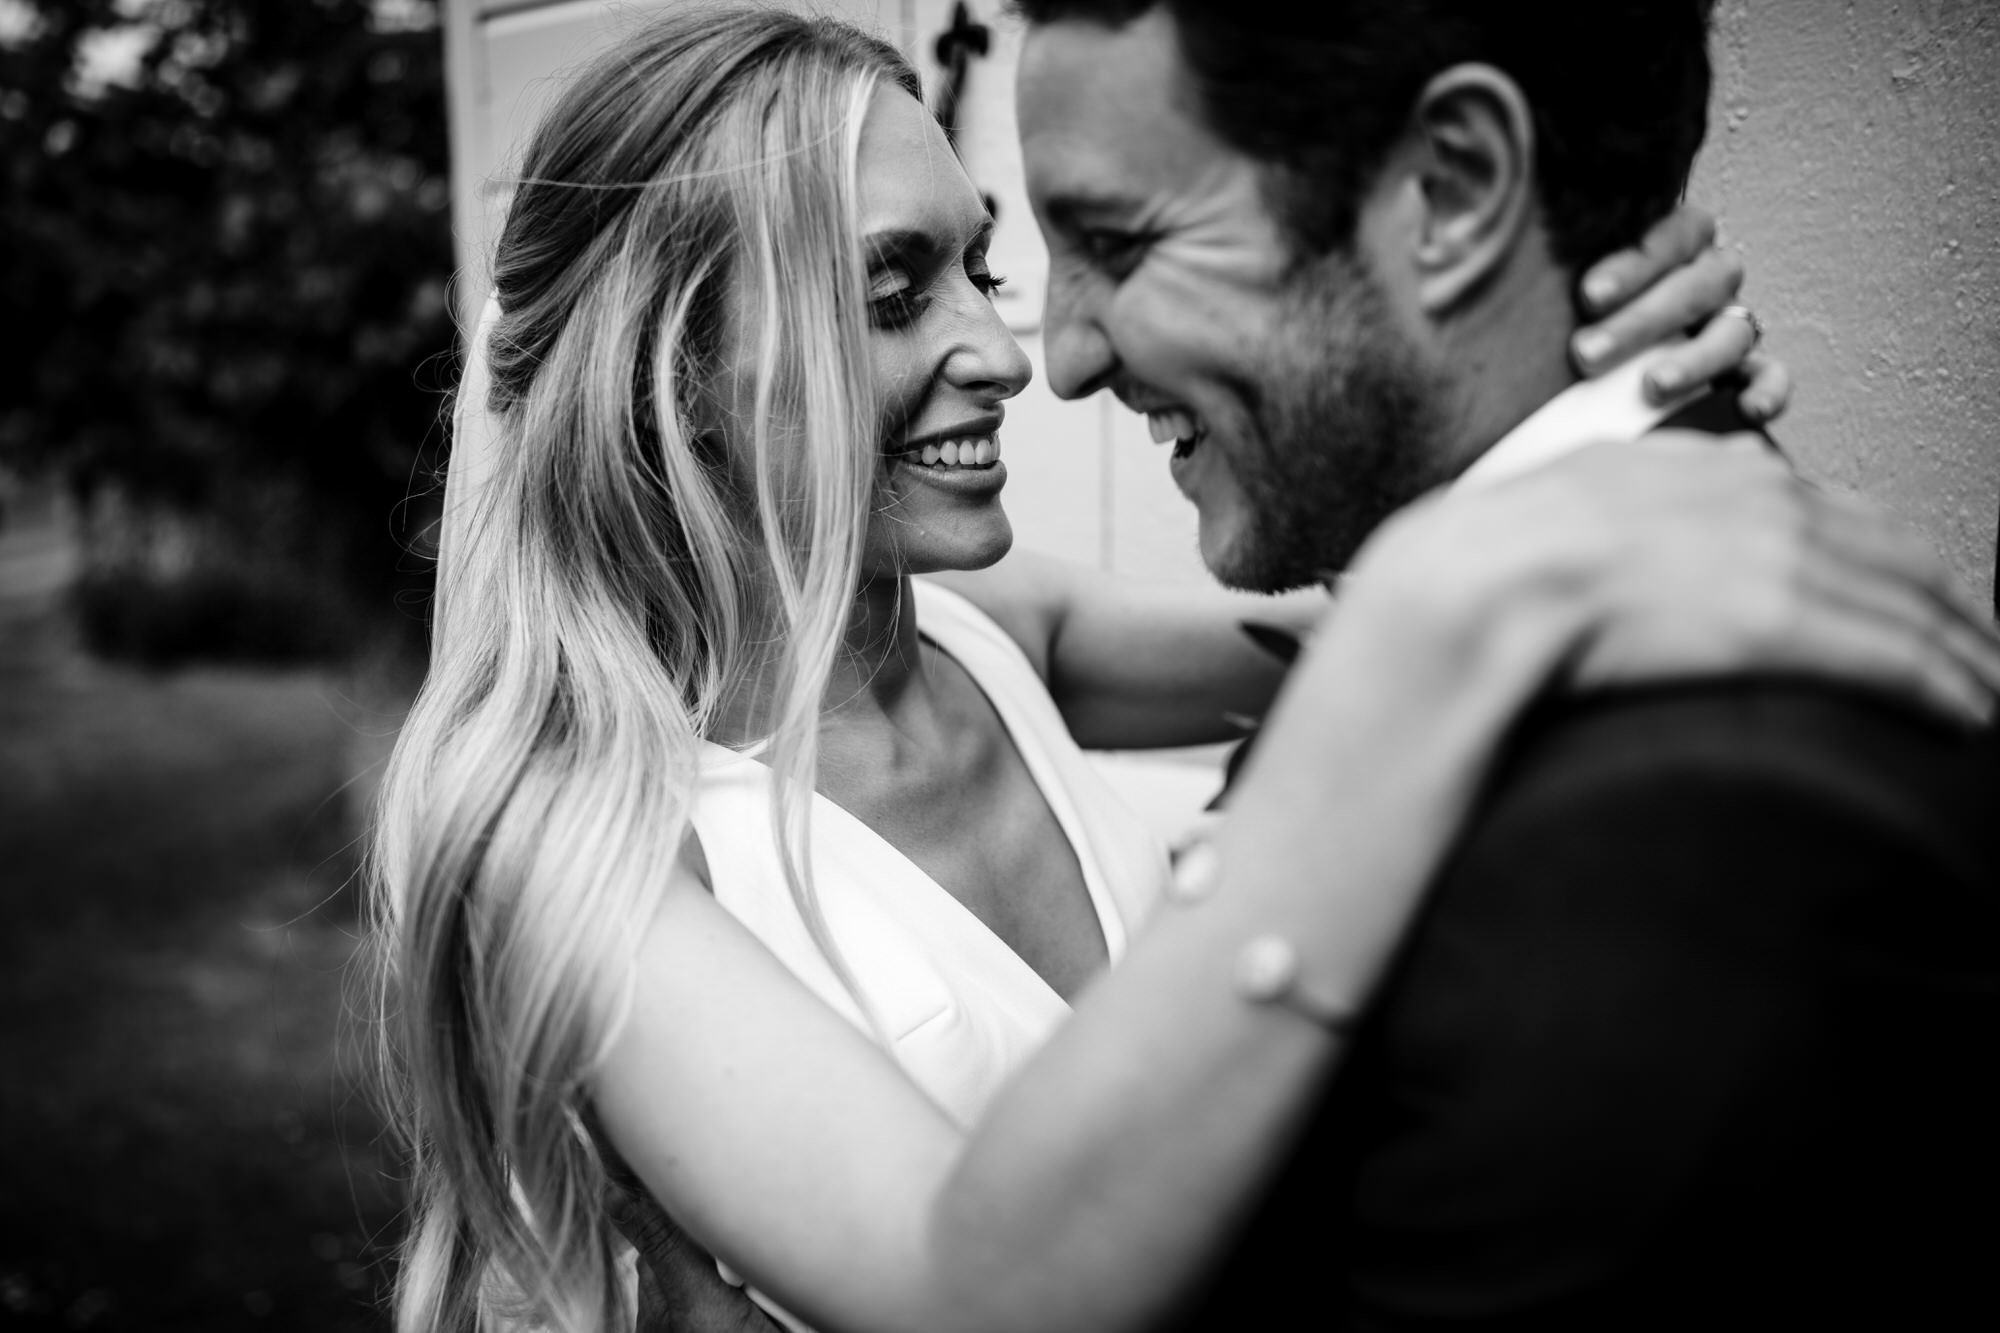 Newlyweds in love